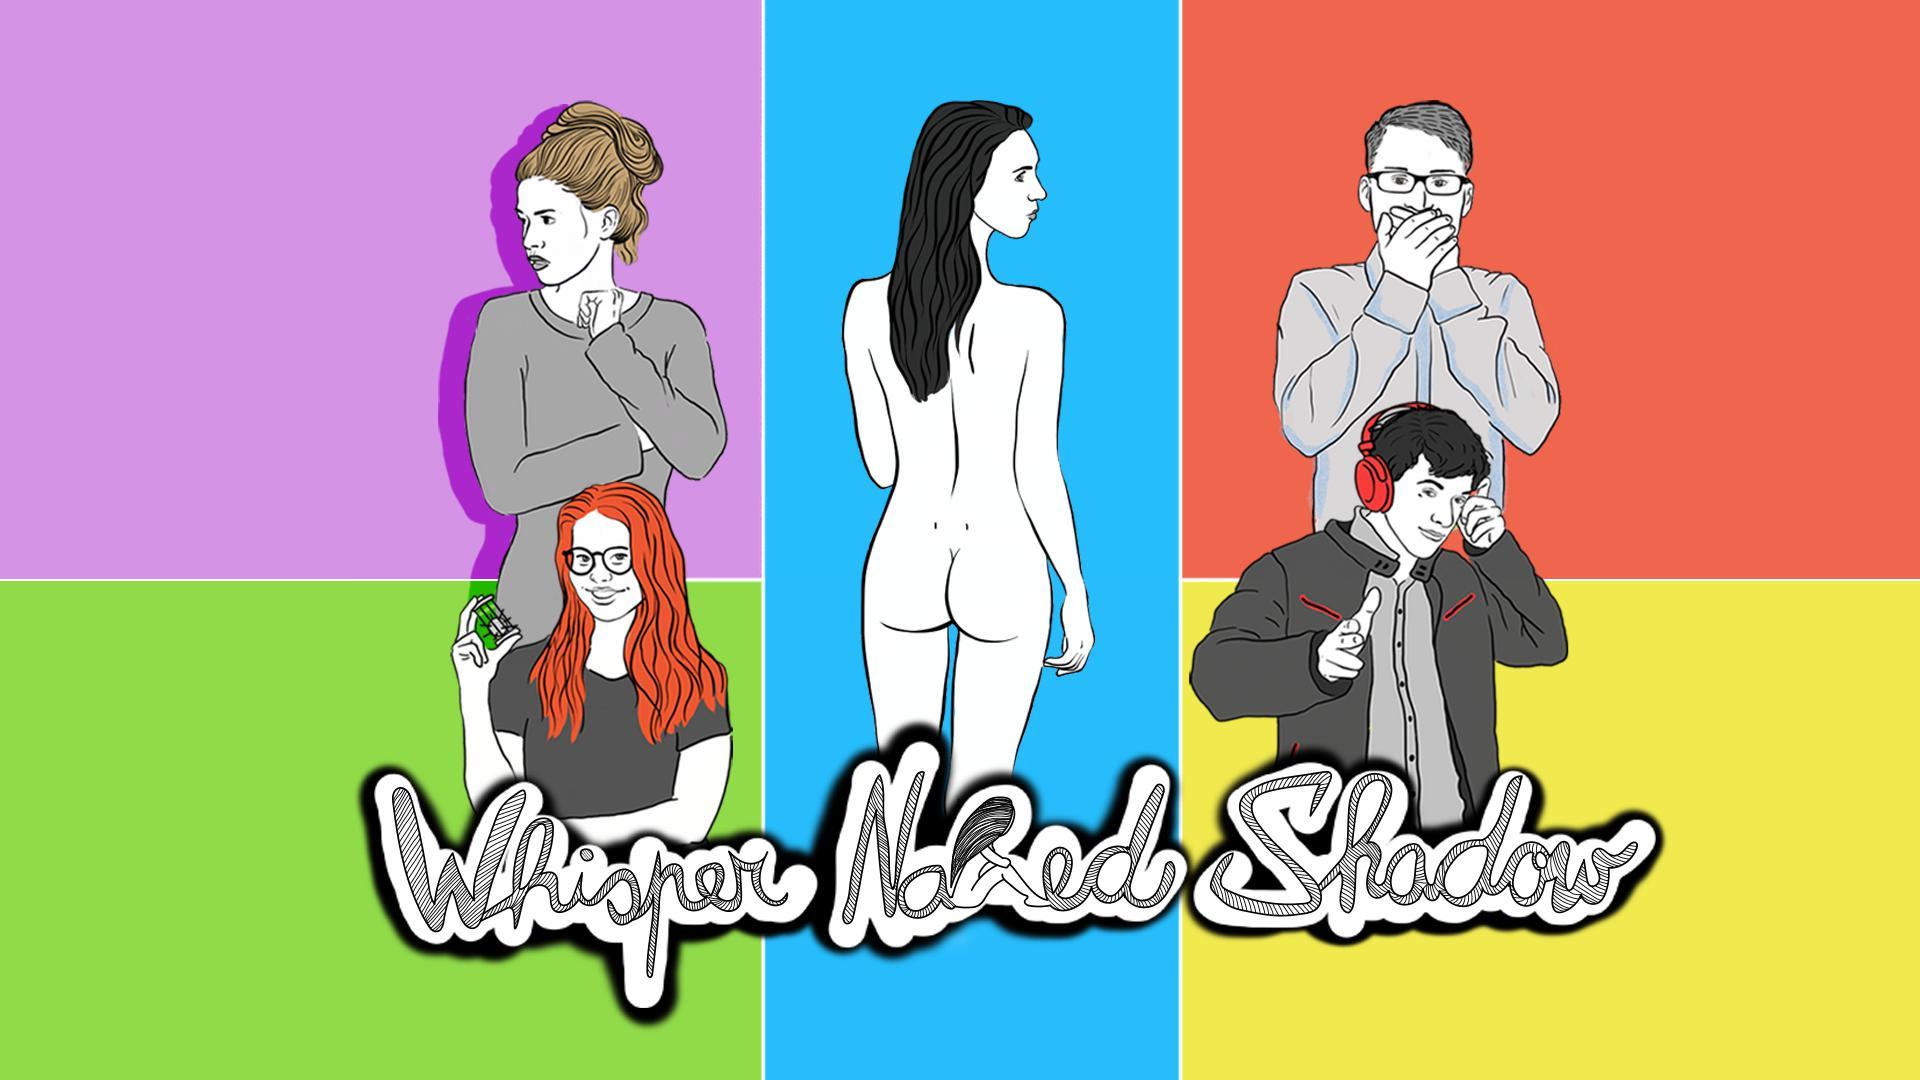 Whisper Naked Shadow (season 2)